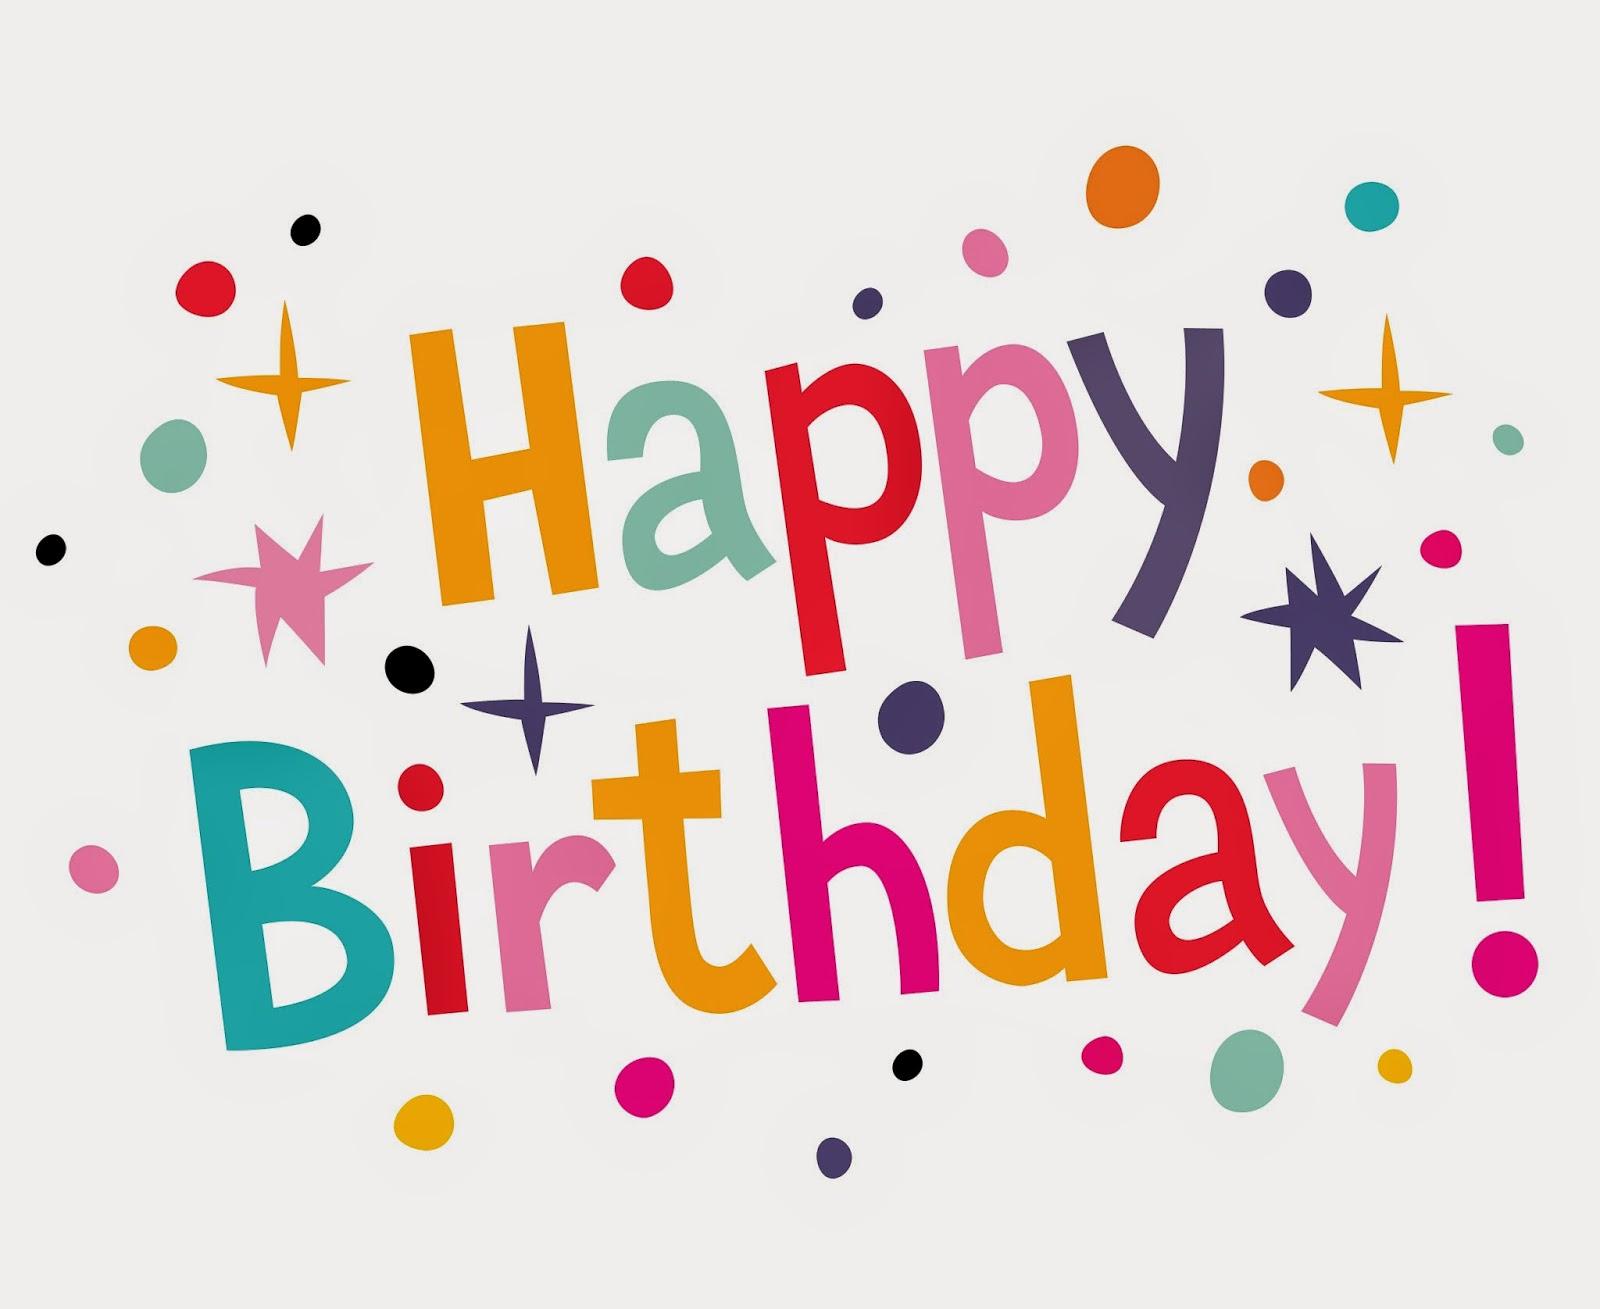 Baby disney happy birthday wallpaper - Zedge happy birthday wallpapers ...